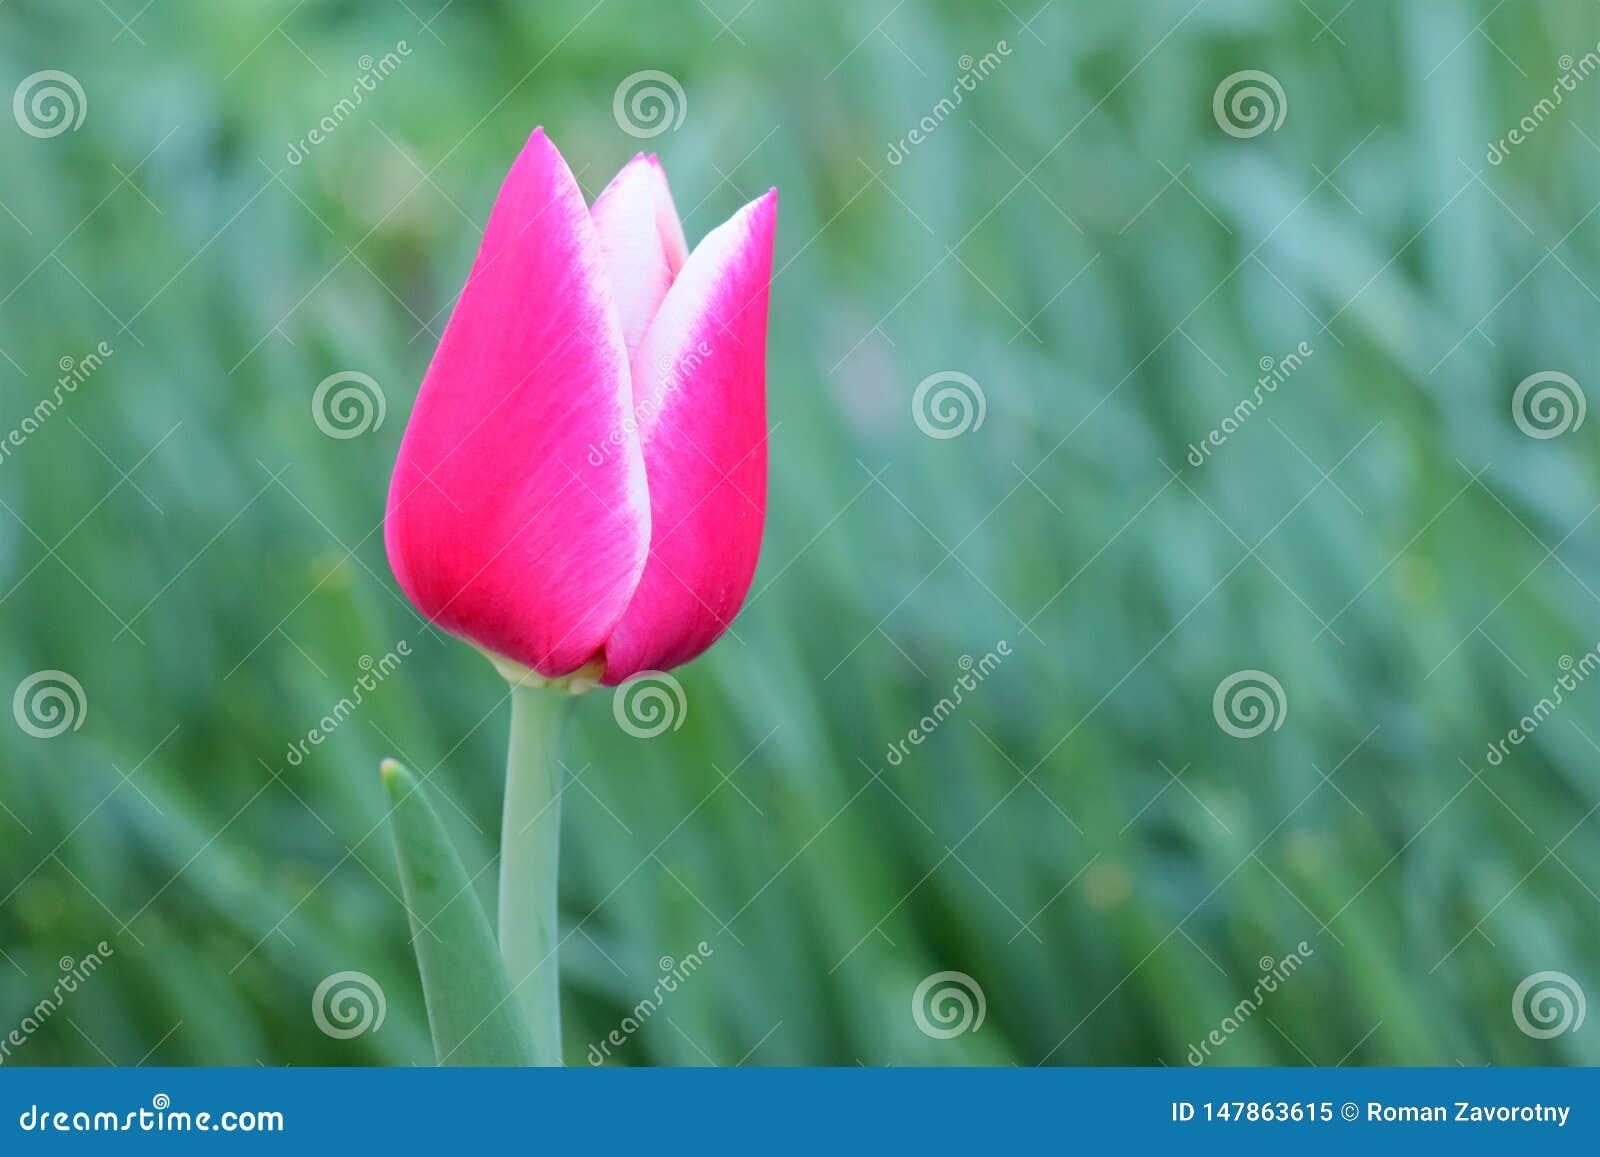 Rode en witte Tulp op groene achtergrond